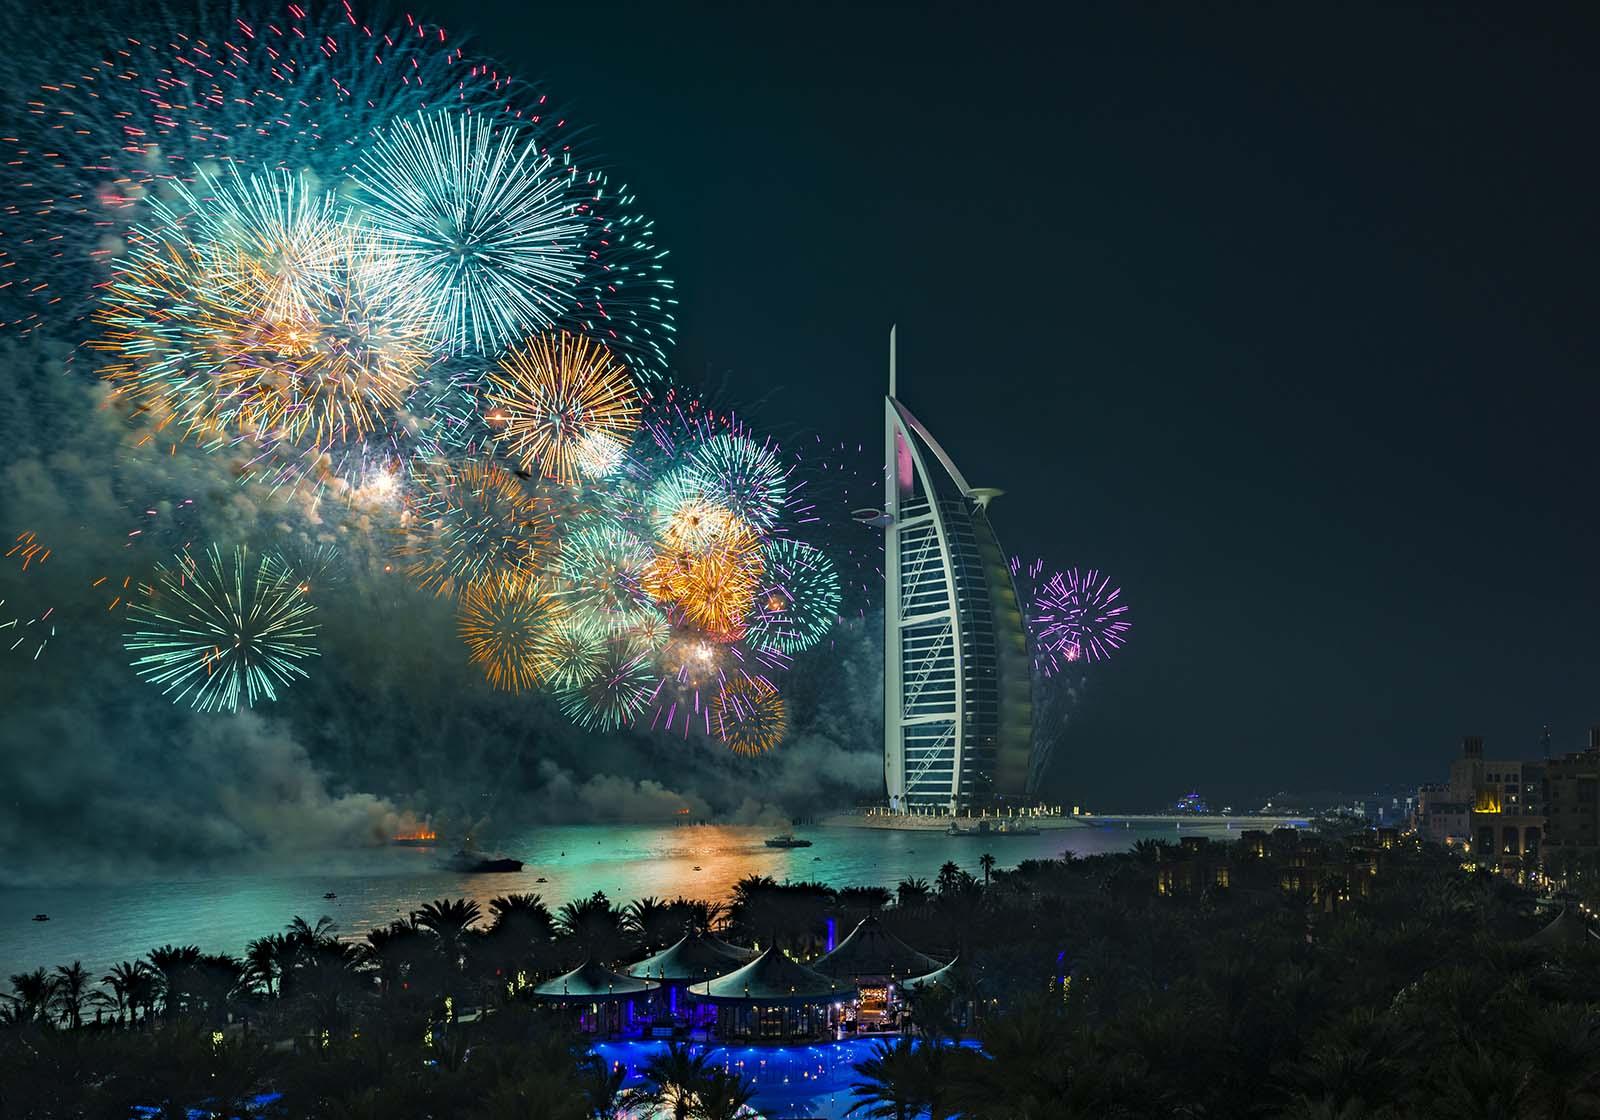 New years eve fireworks celebrations